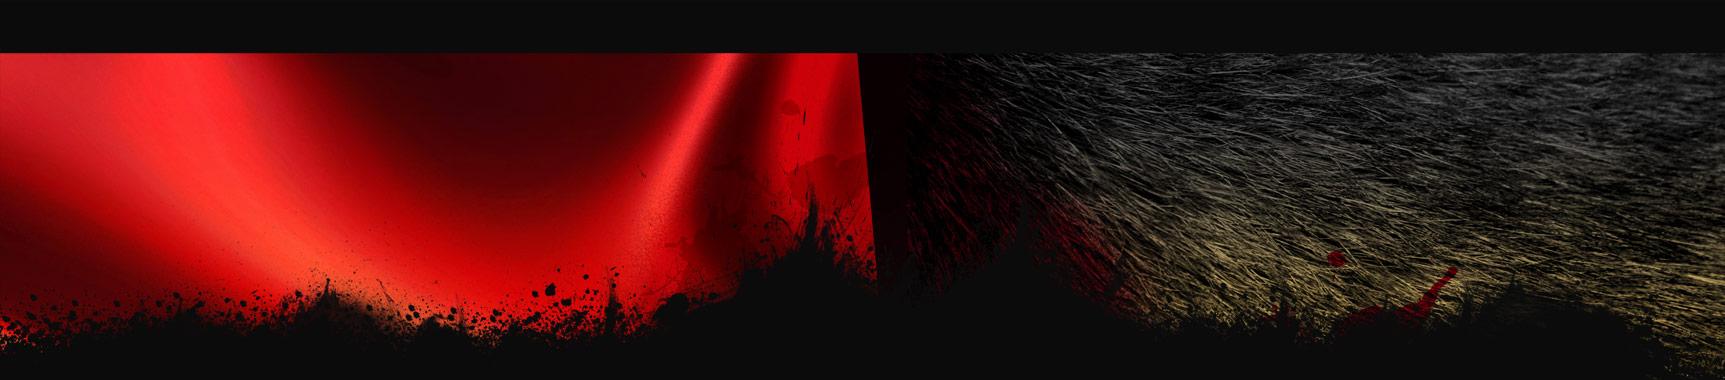 bandeau-rougegore_02